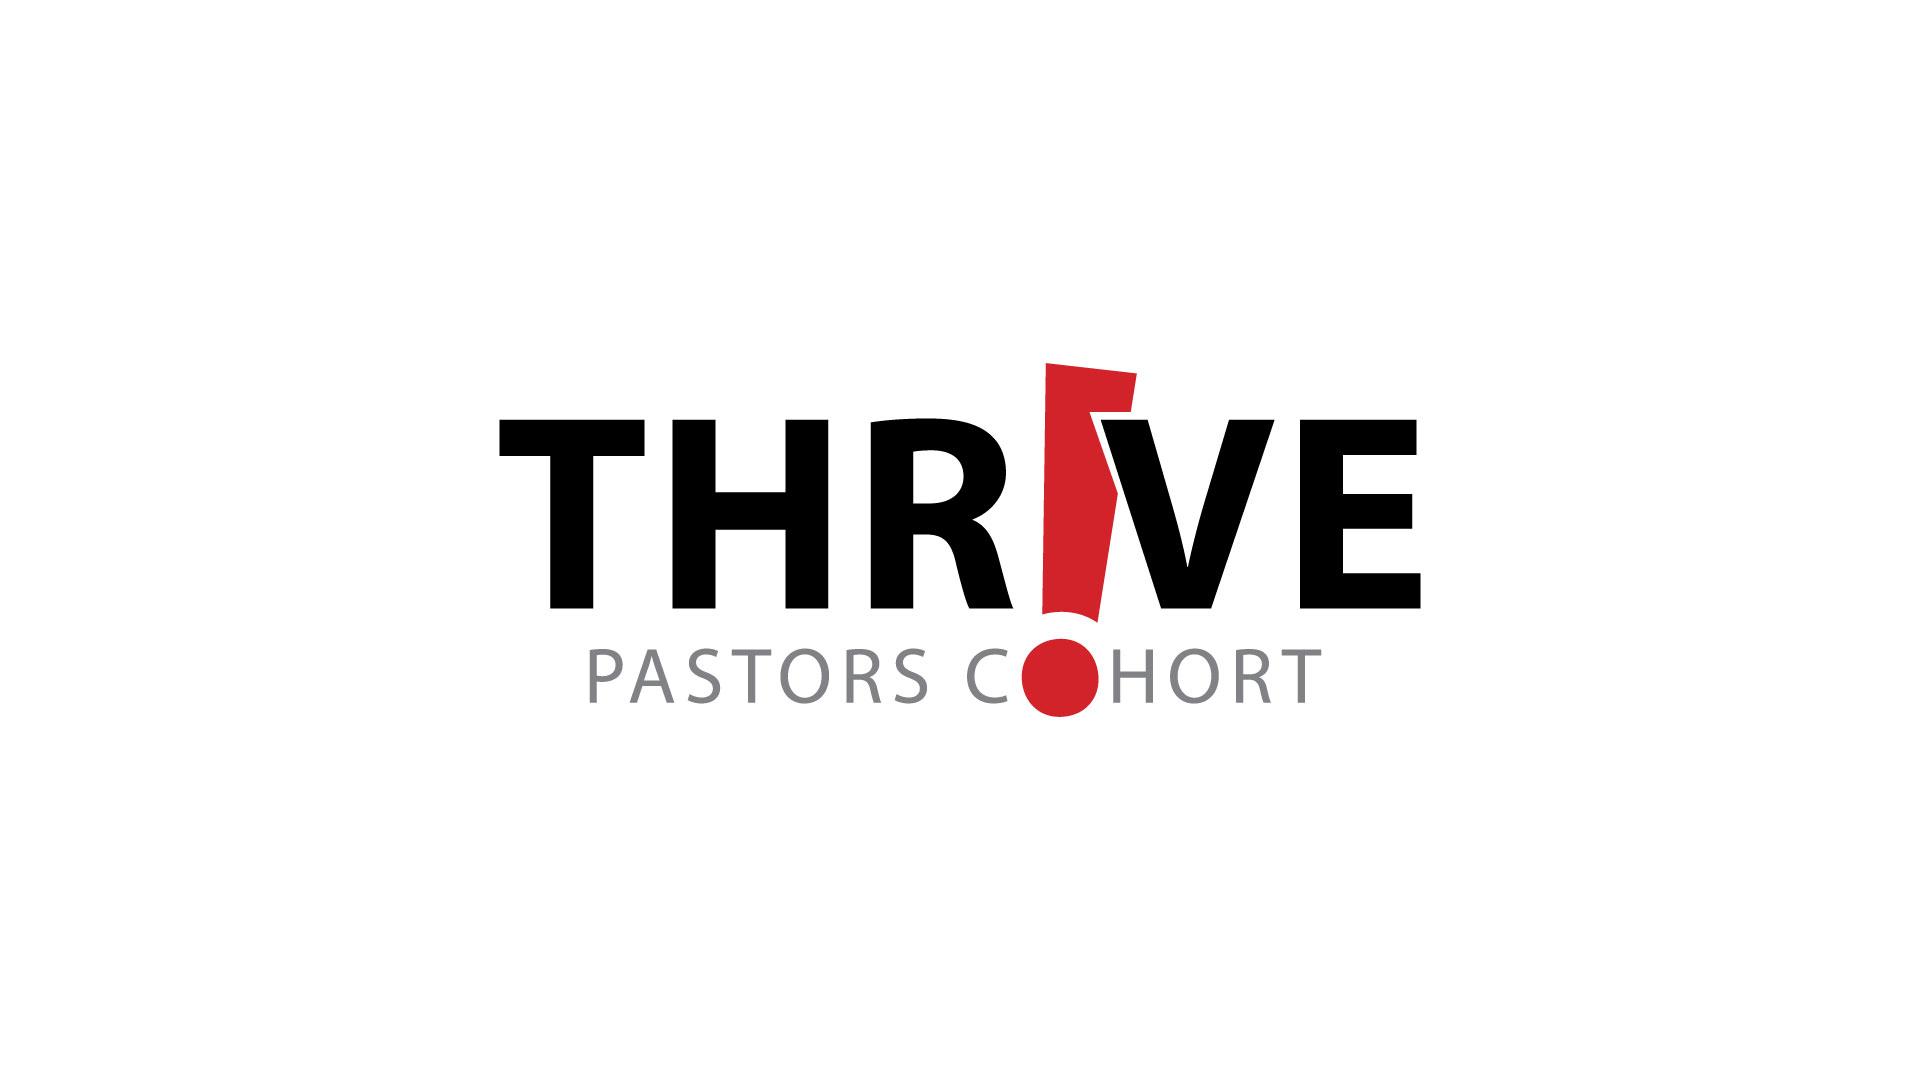 Thrive Pastors Cohort